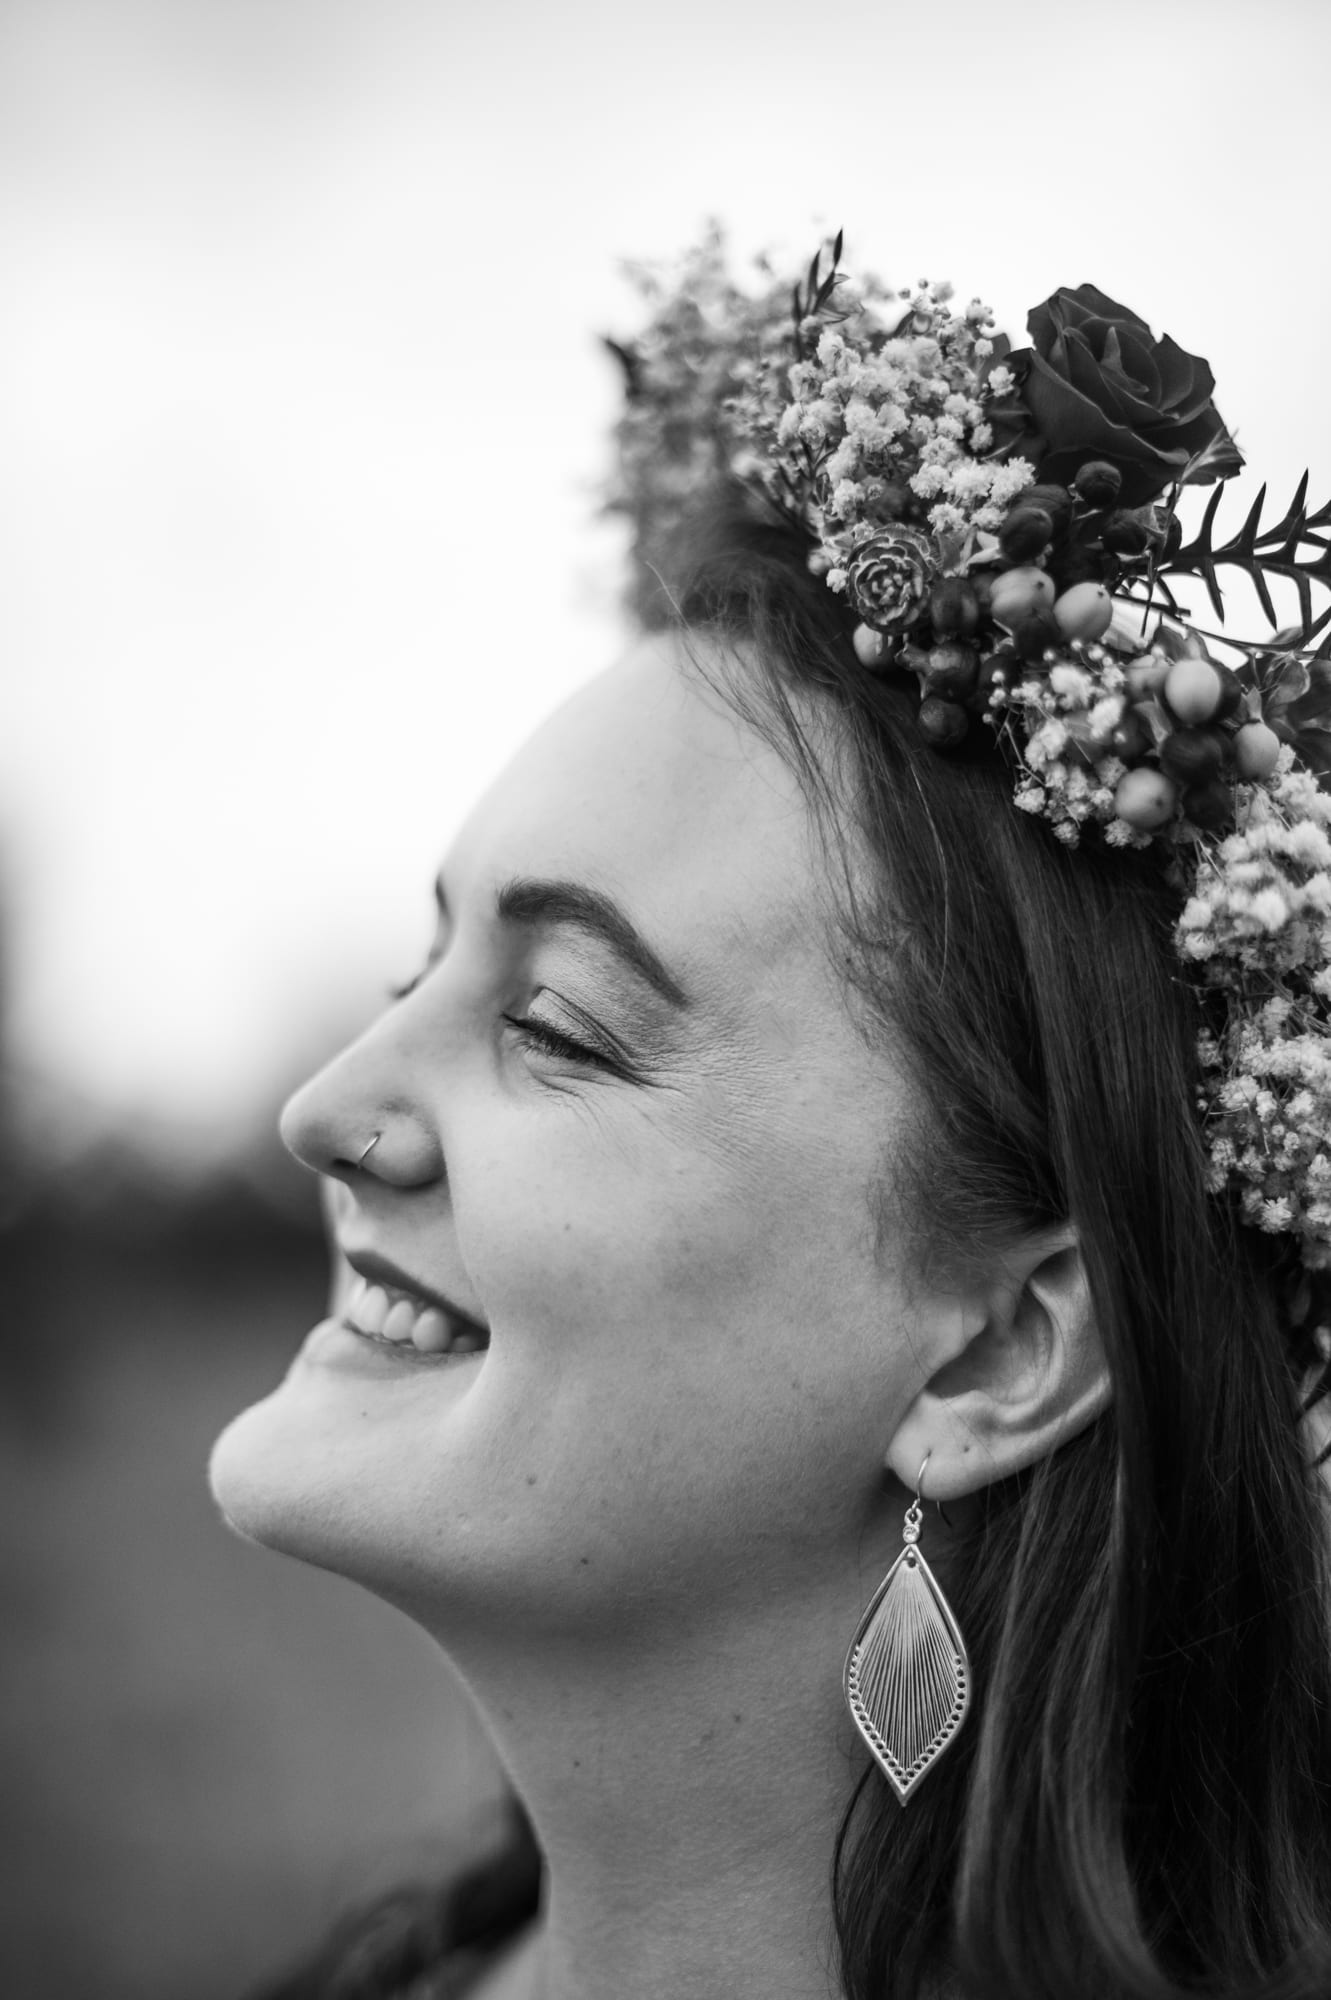 wesley-lanie-george-fernridge-engagement-June-Richards-Photography-Destination-Weddings-Elopements-Garden-Route-12